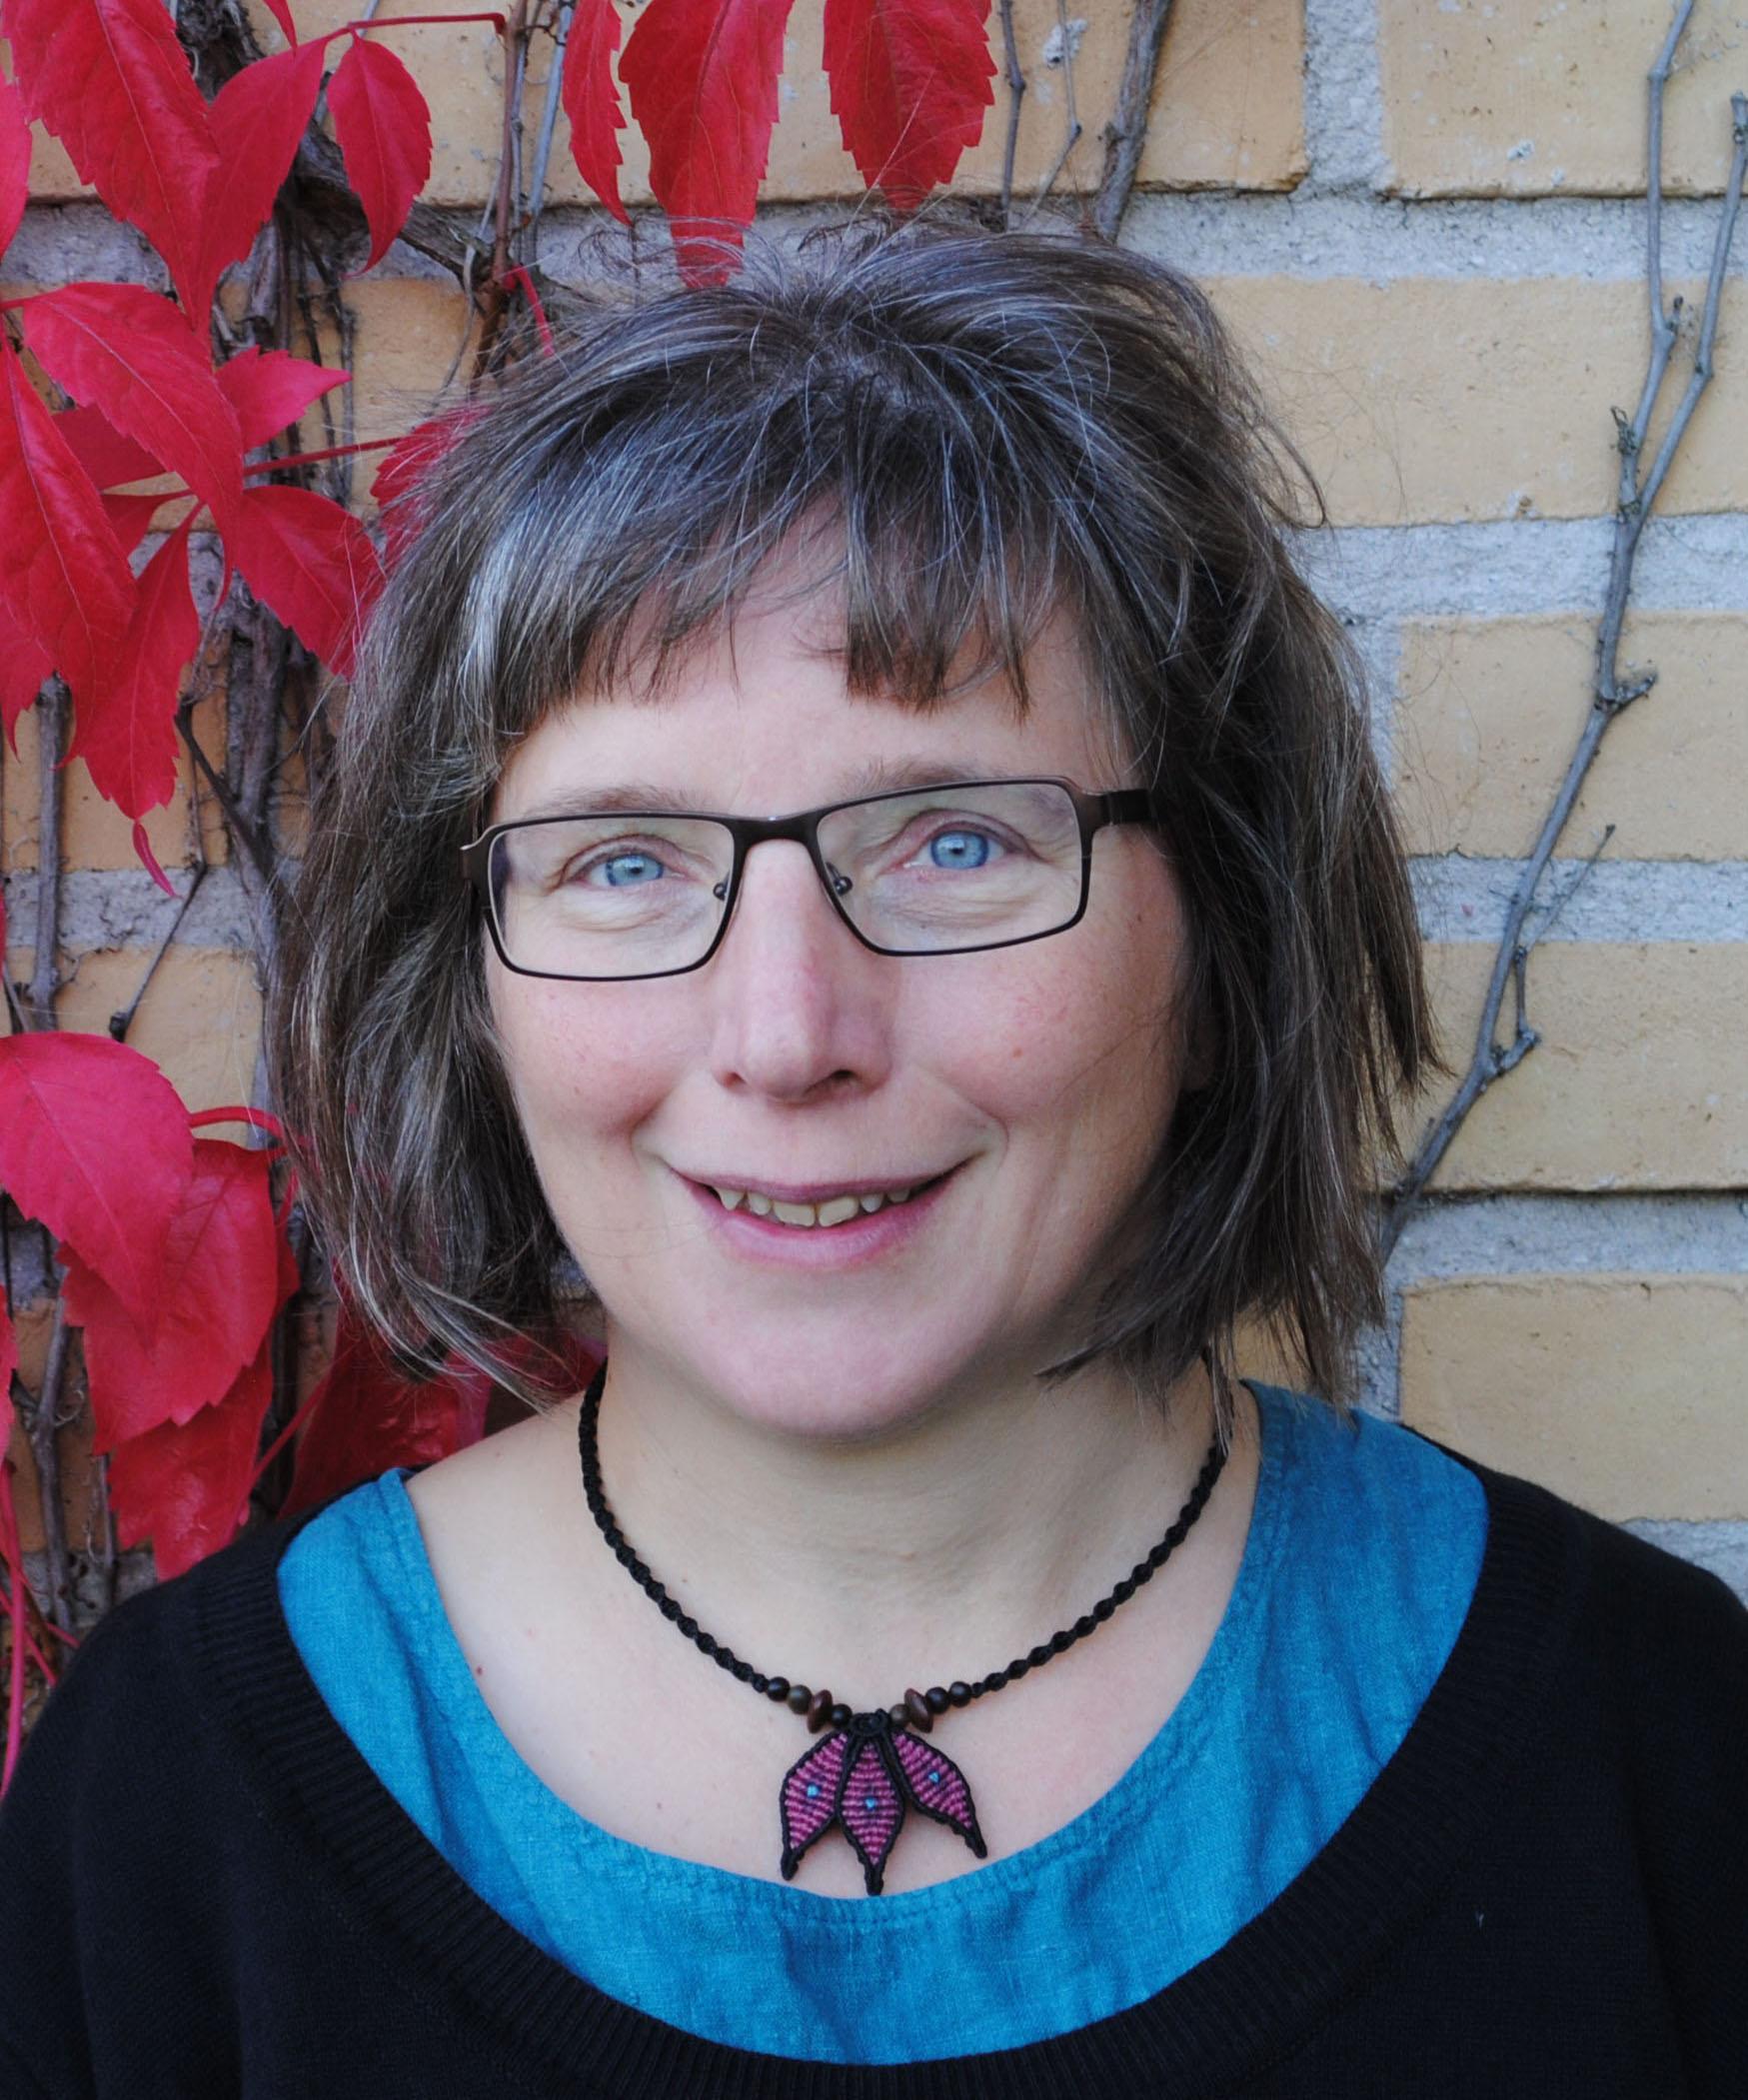 Lena Maria Nilsson